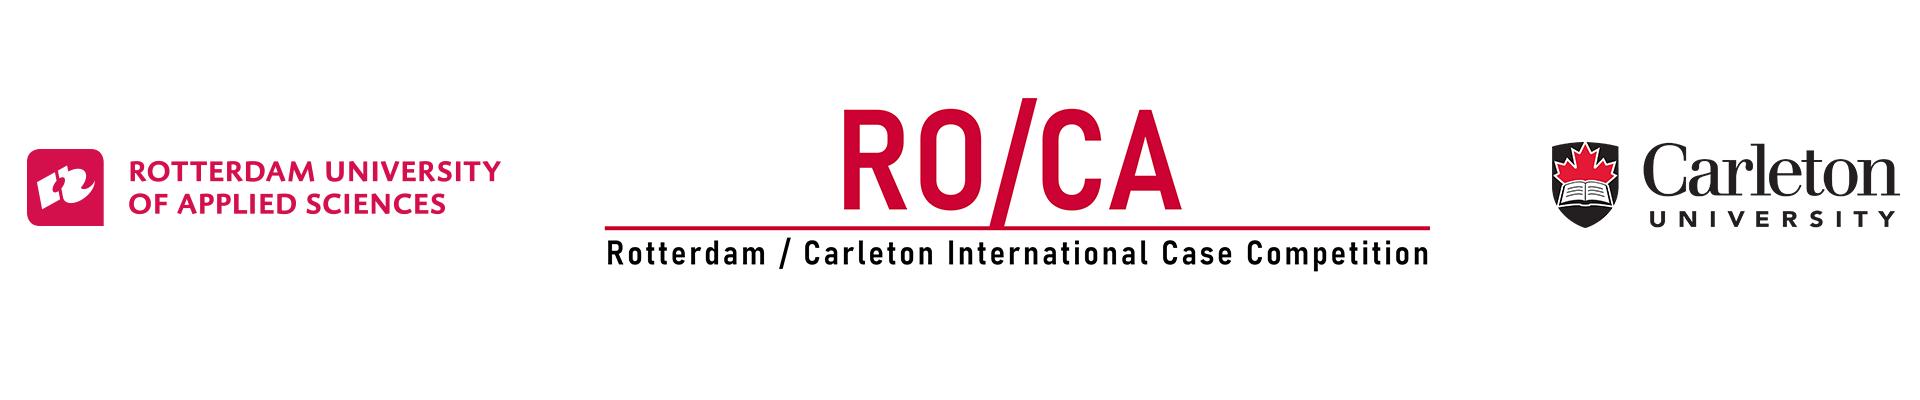 2. ROCA 2020 EVENTS  ROTTERDAM – CARLETON INTERNATIONAL CASE COMPETITION